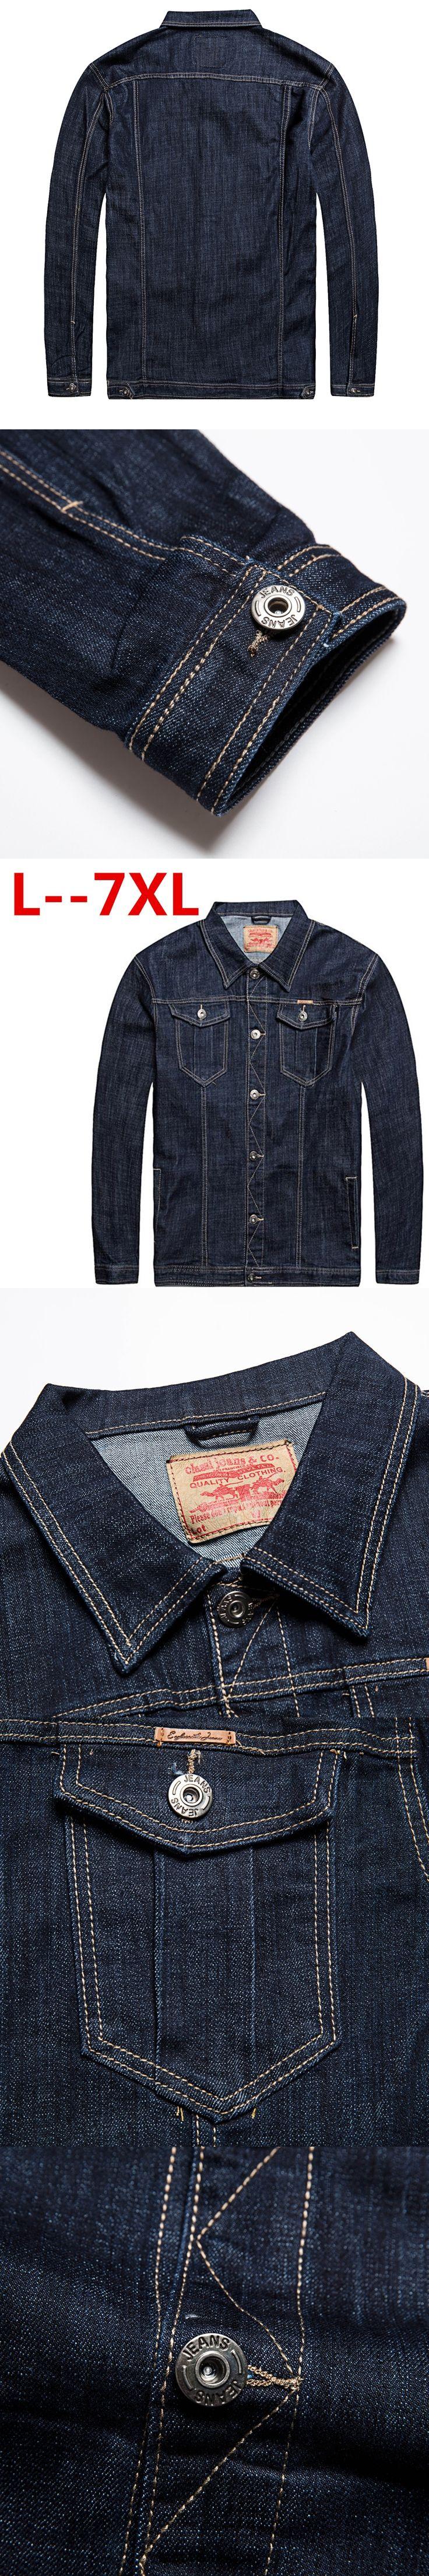 10XL 8XL 6XL 5XL Men's Denim Jackets New Men Fashion Cowboy Motorcycle Jacket Caots Clothing Male Classic Casual Loose Outwear